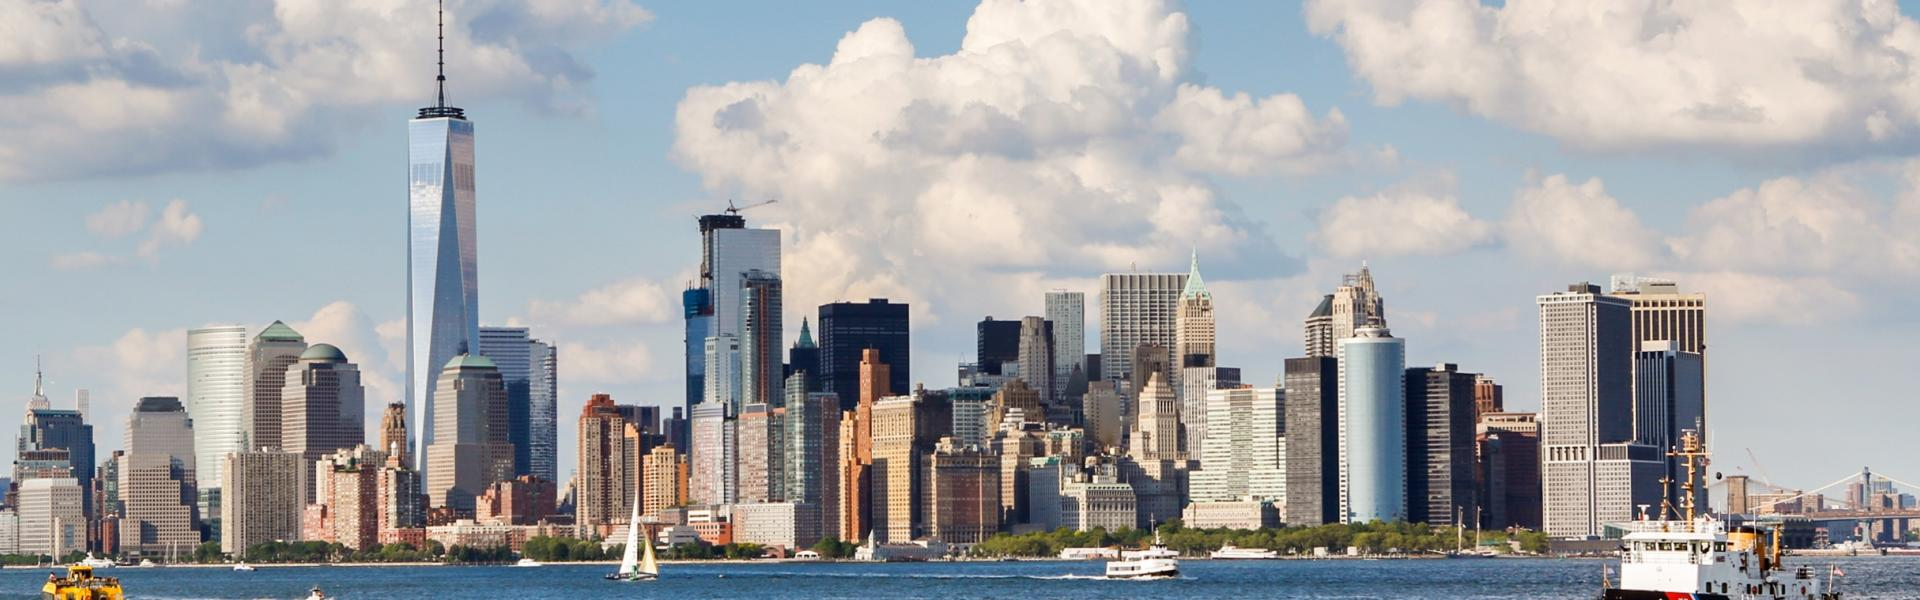 Lower Manhattan, Skyline, NYC,